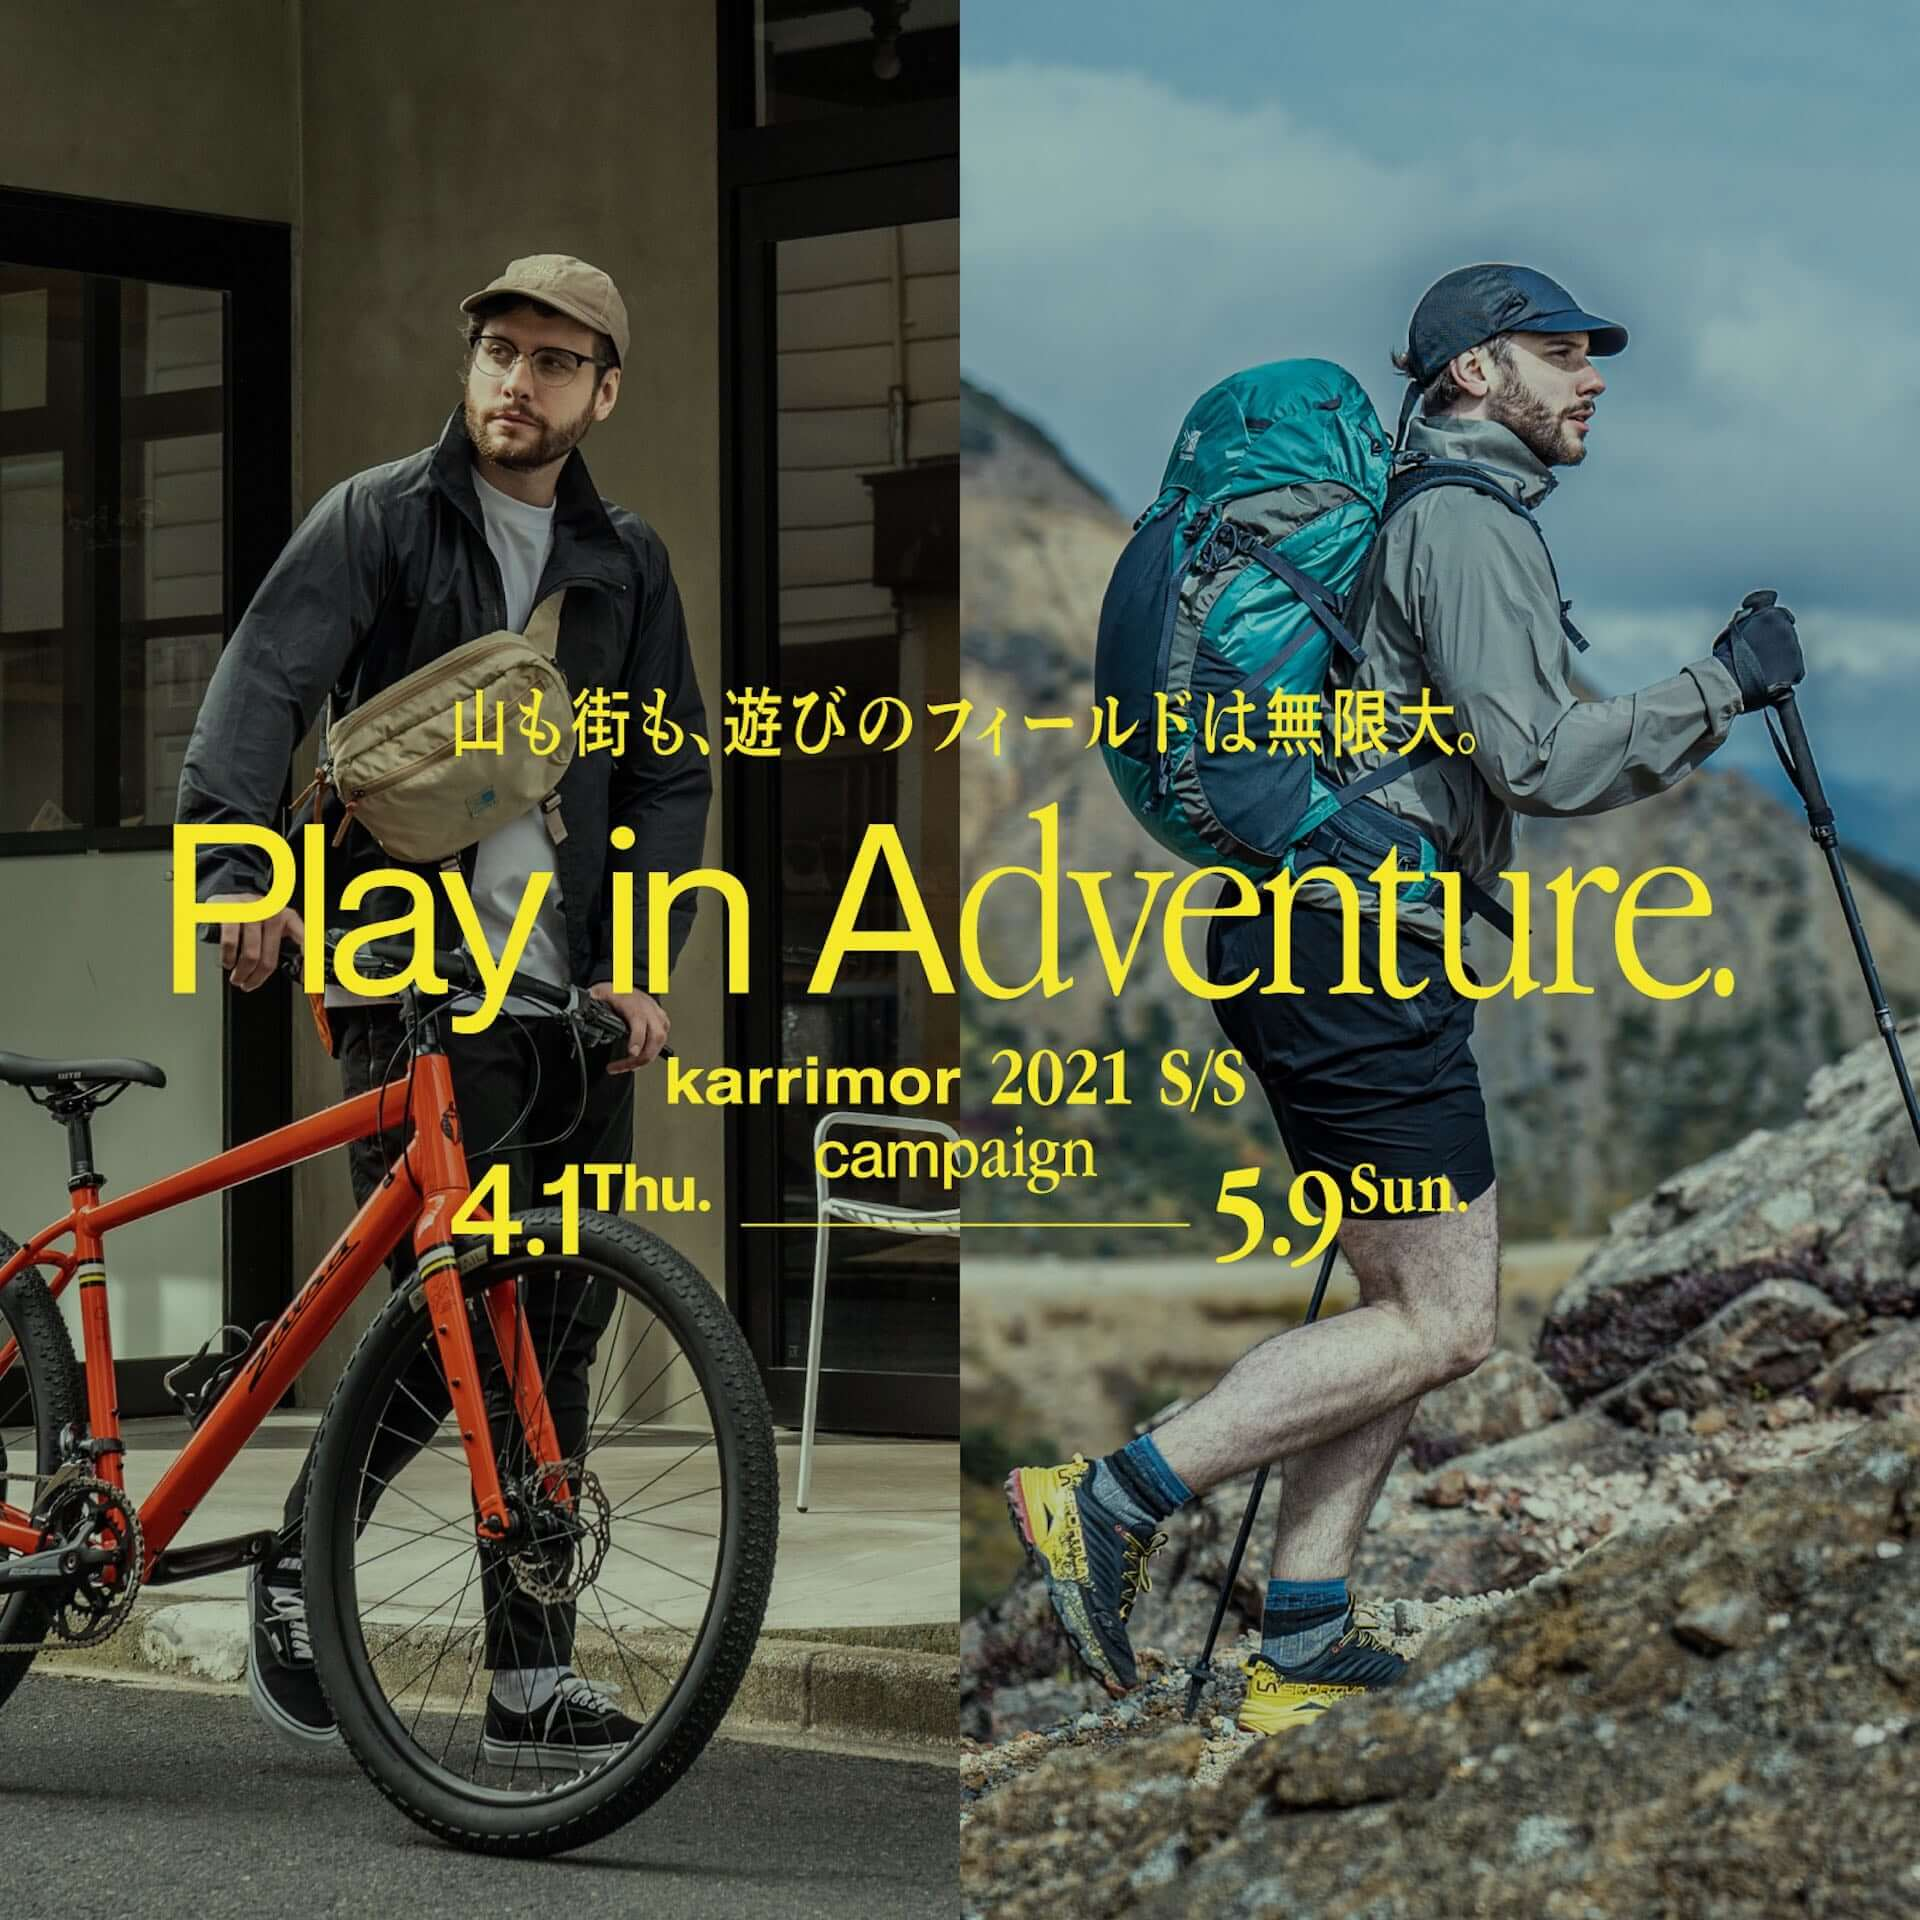 karrimorオリジナルのマルチカード型ツールをゲットしよう!2021年春夏シーズナルキャンペーン「Play in Adventure」が開催決定 lf210330_karrimor_12-1920x1920